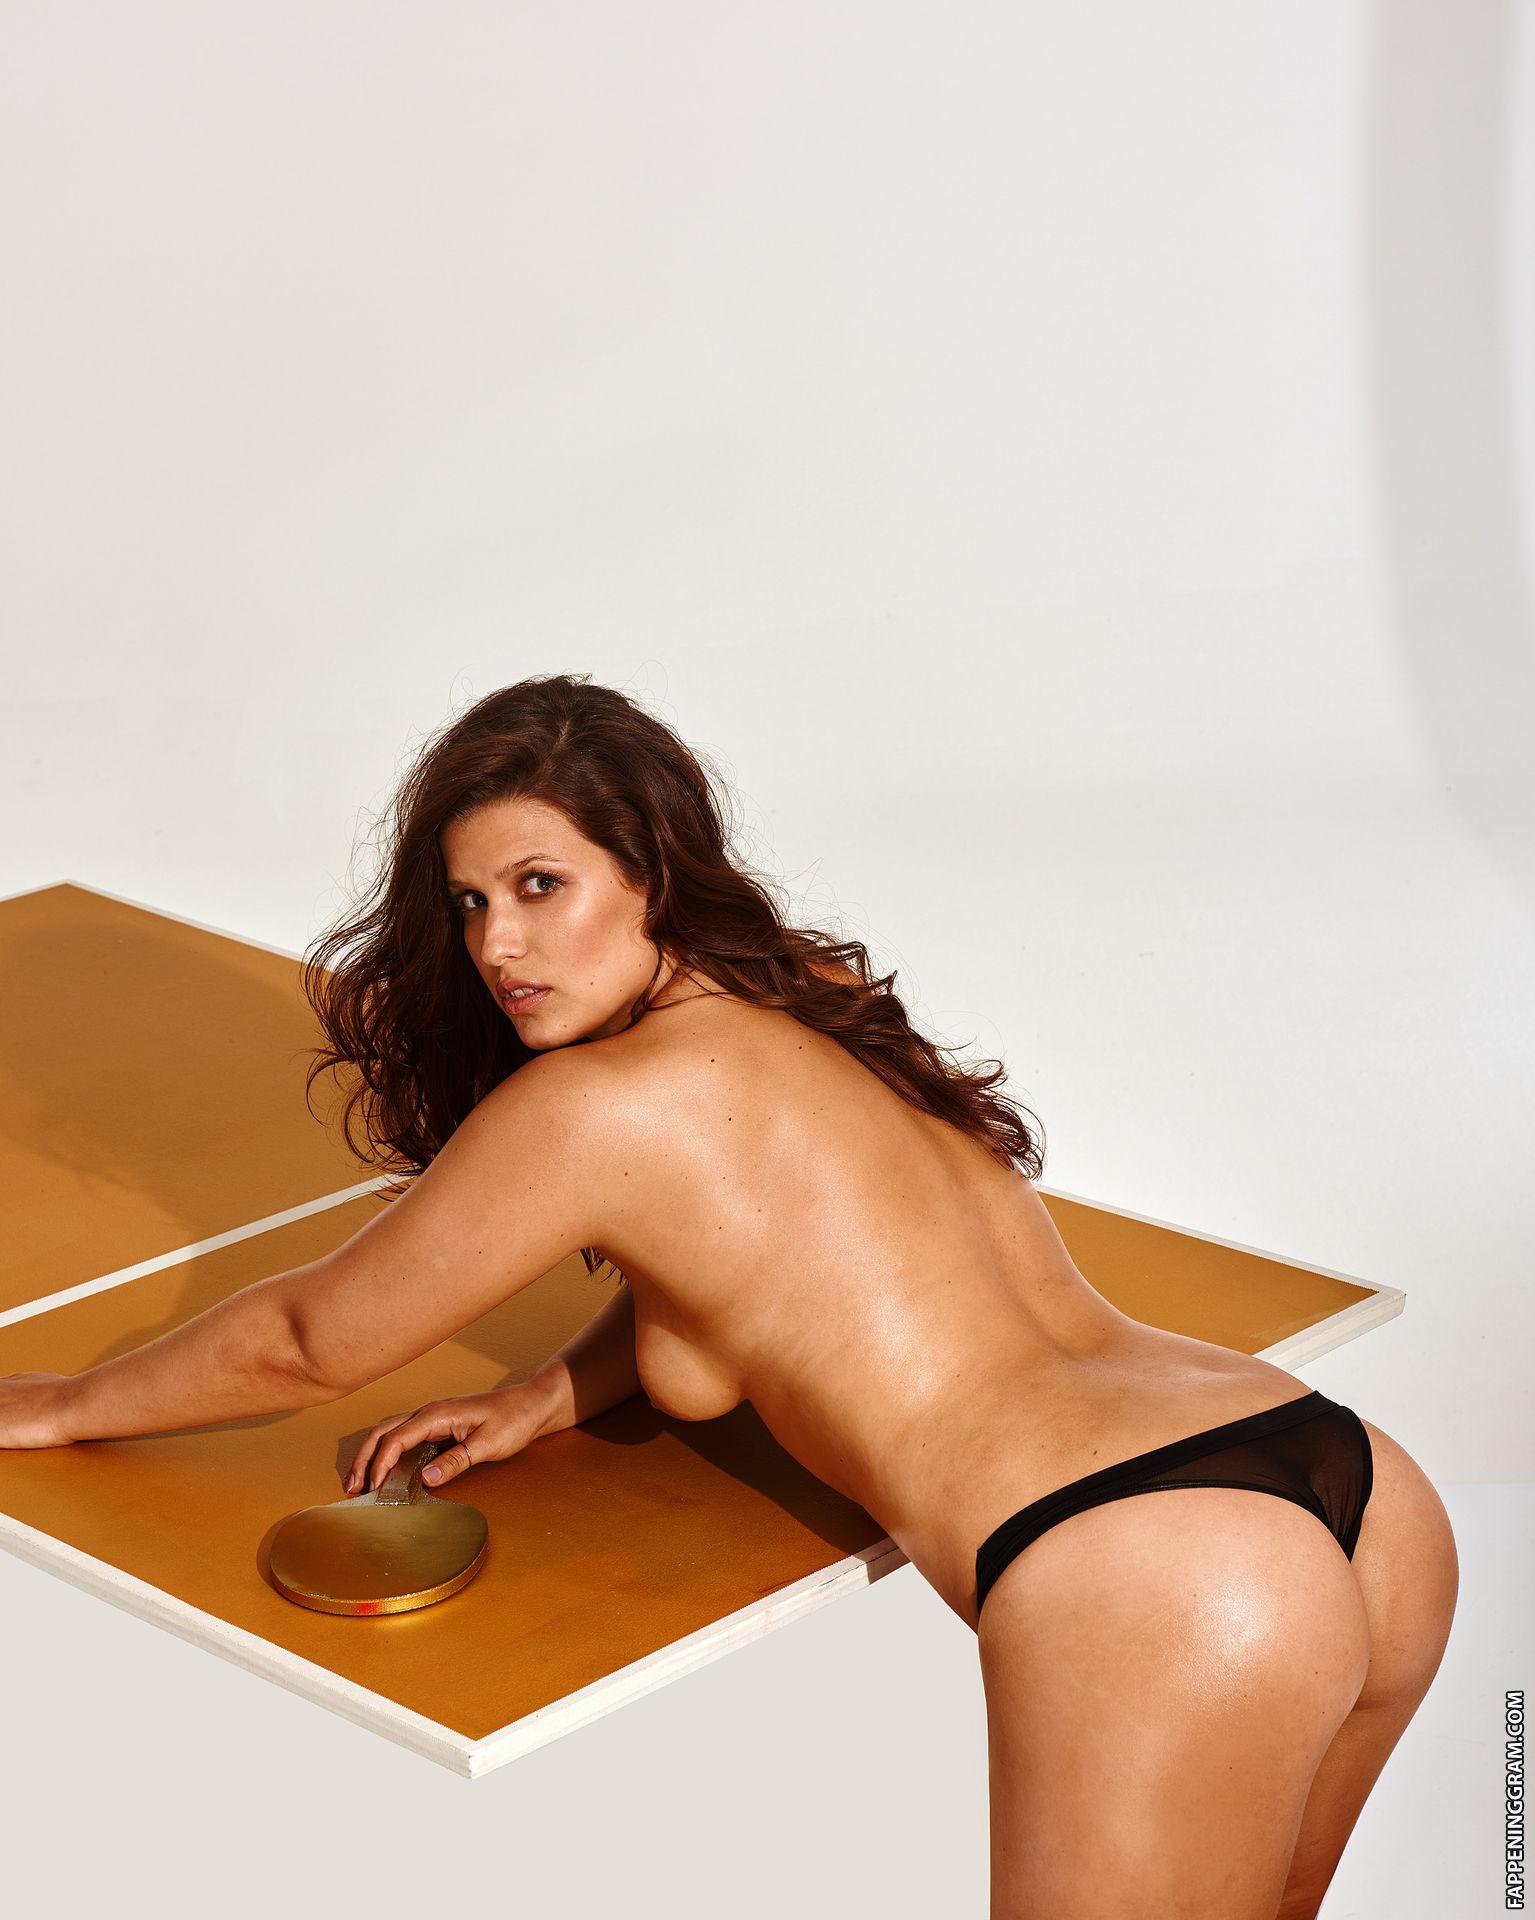 Sabrina nackt Sancler 41 Hottest